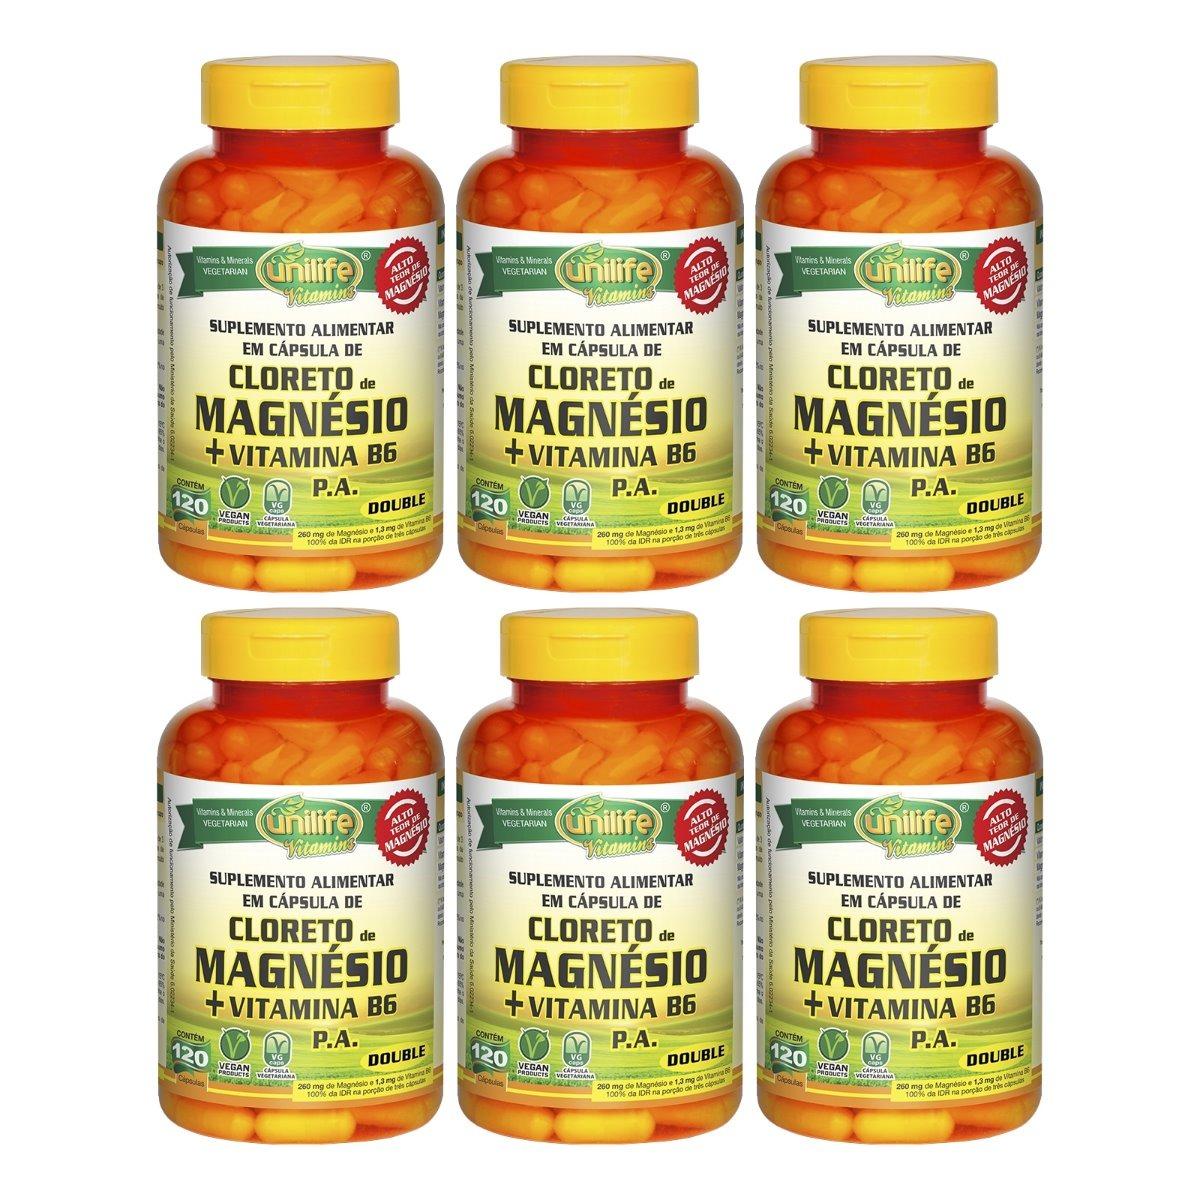 Cloreto De Magnésio P.A. + Vitamina B6 - 120 Cápsulas 800mg Unilife Kit 6 Unidades